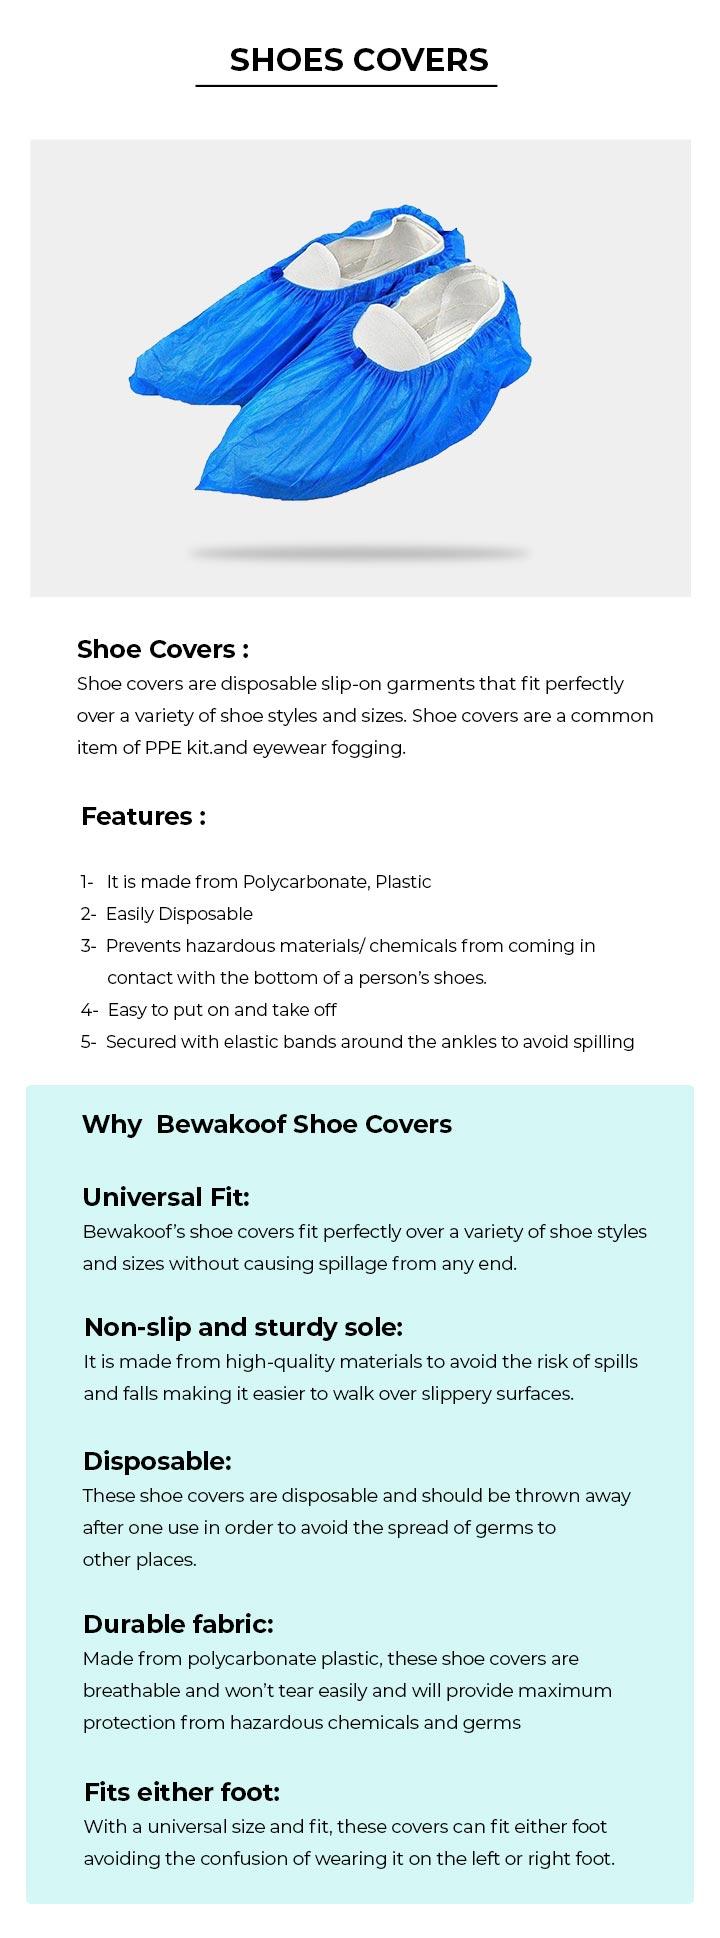 Disposable Shoe Cover - Pack of 100 Description Image Mobile Site 0@Bewakoof.com